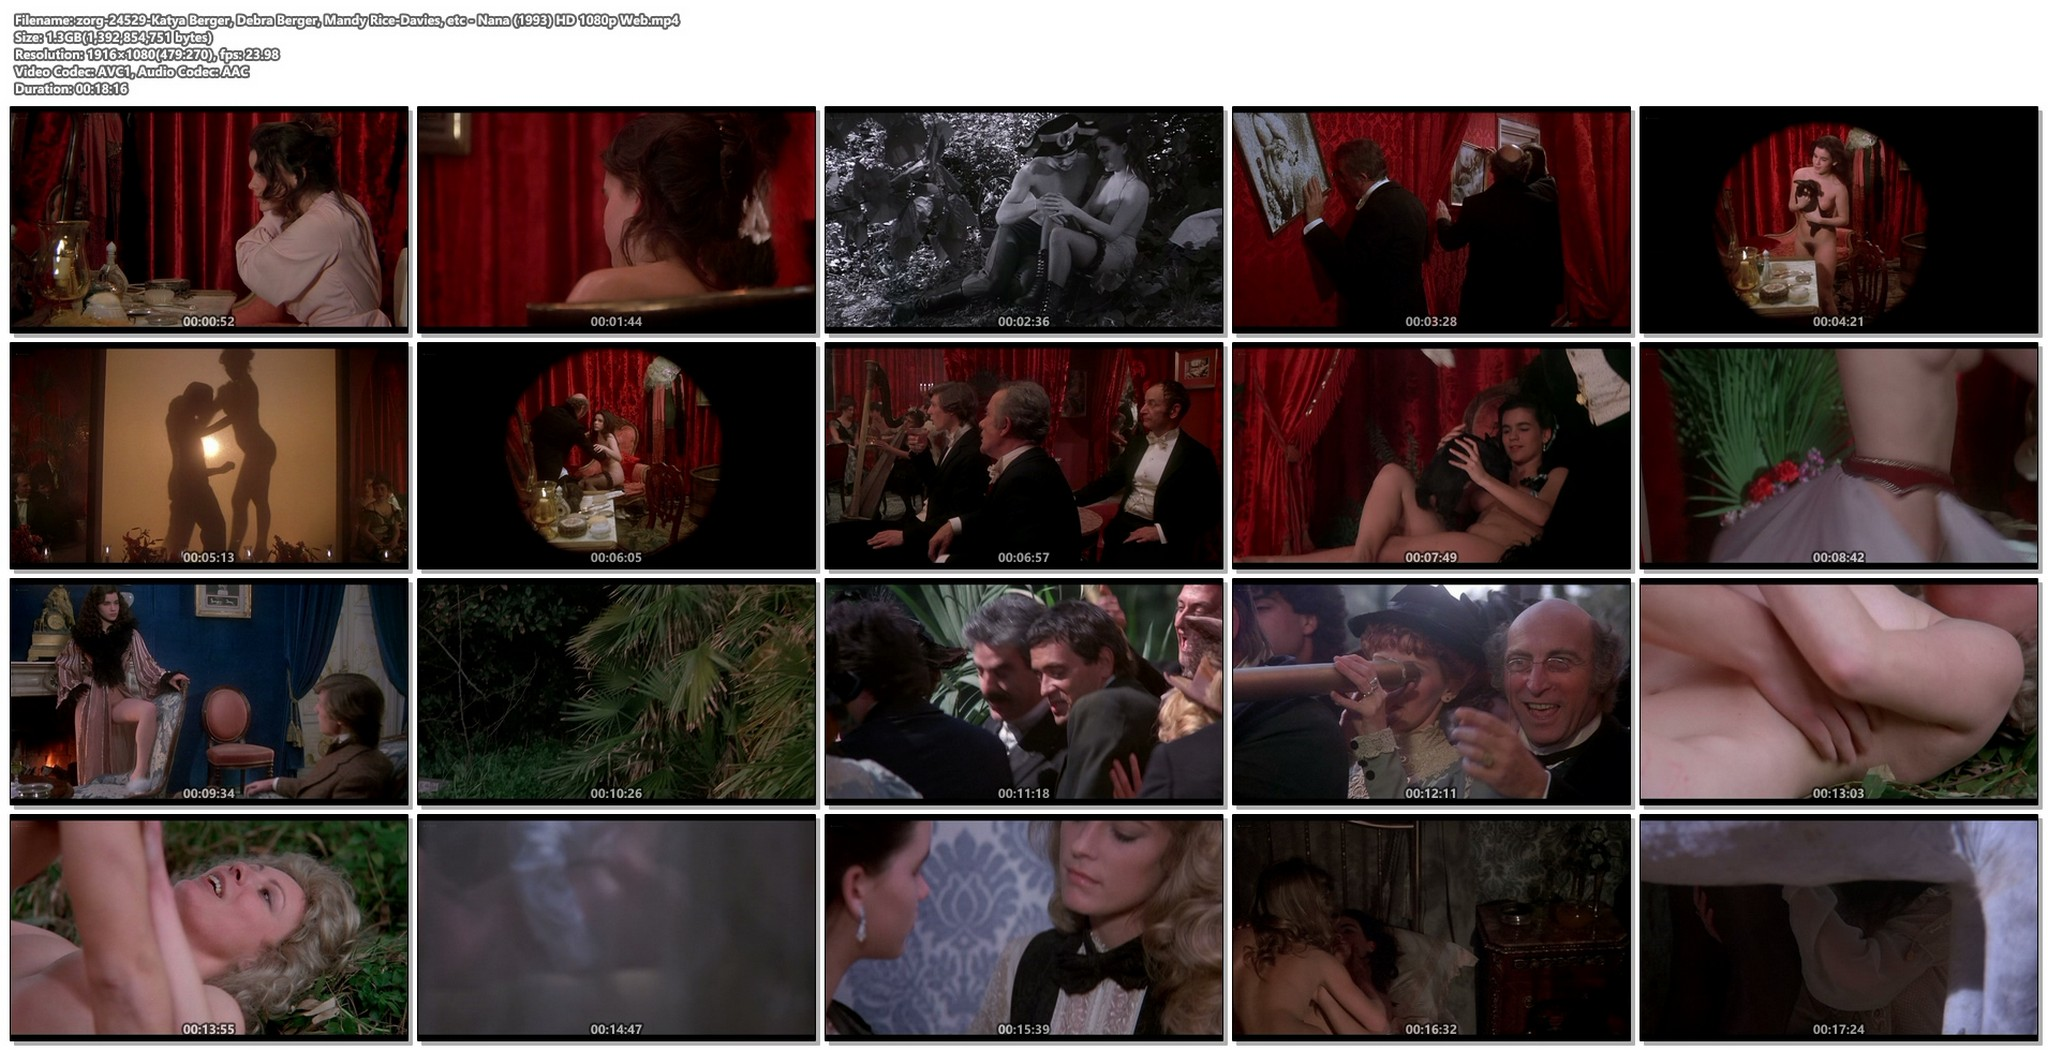 Katya Berger nude full frontal Debra Berger Mandy Rice Davies Annie Belle etc nude too Nana 1993 HD 1080p Web 019